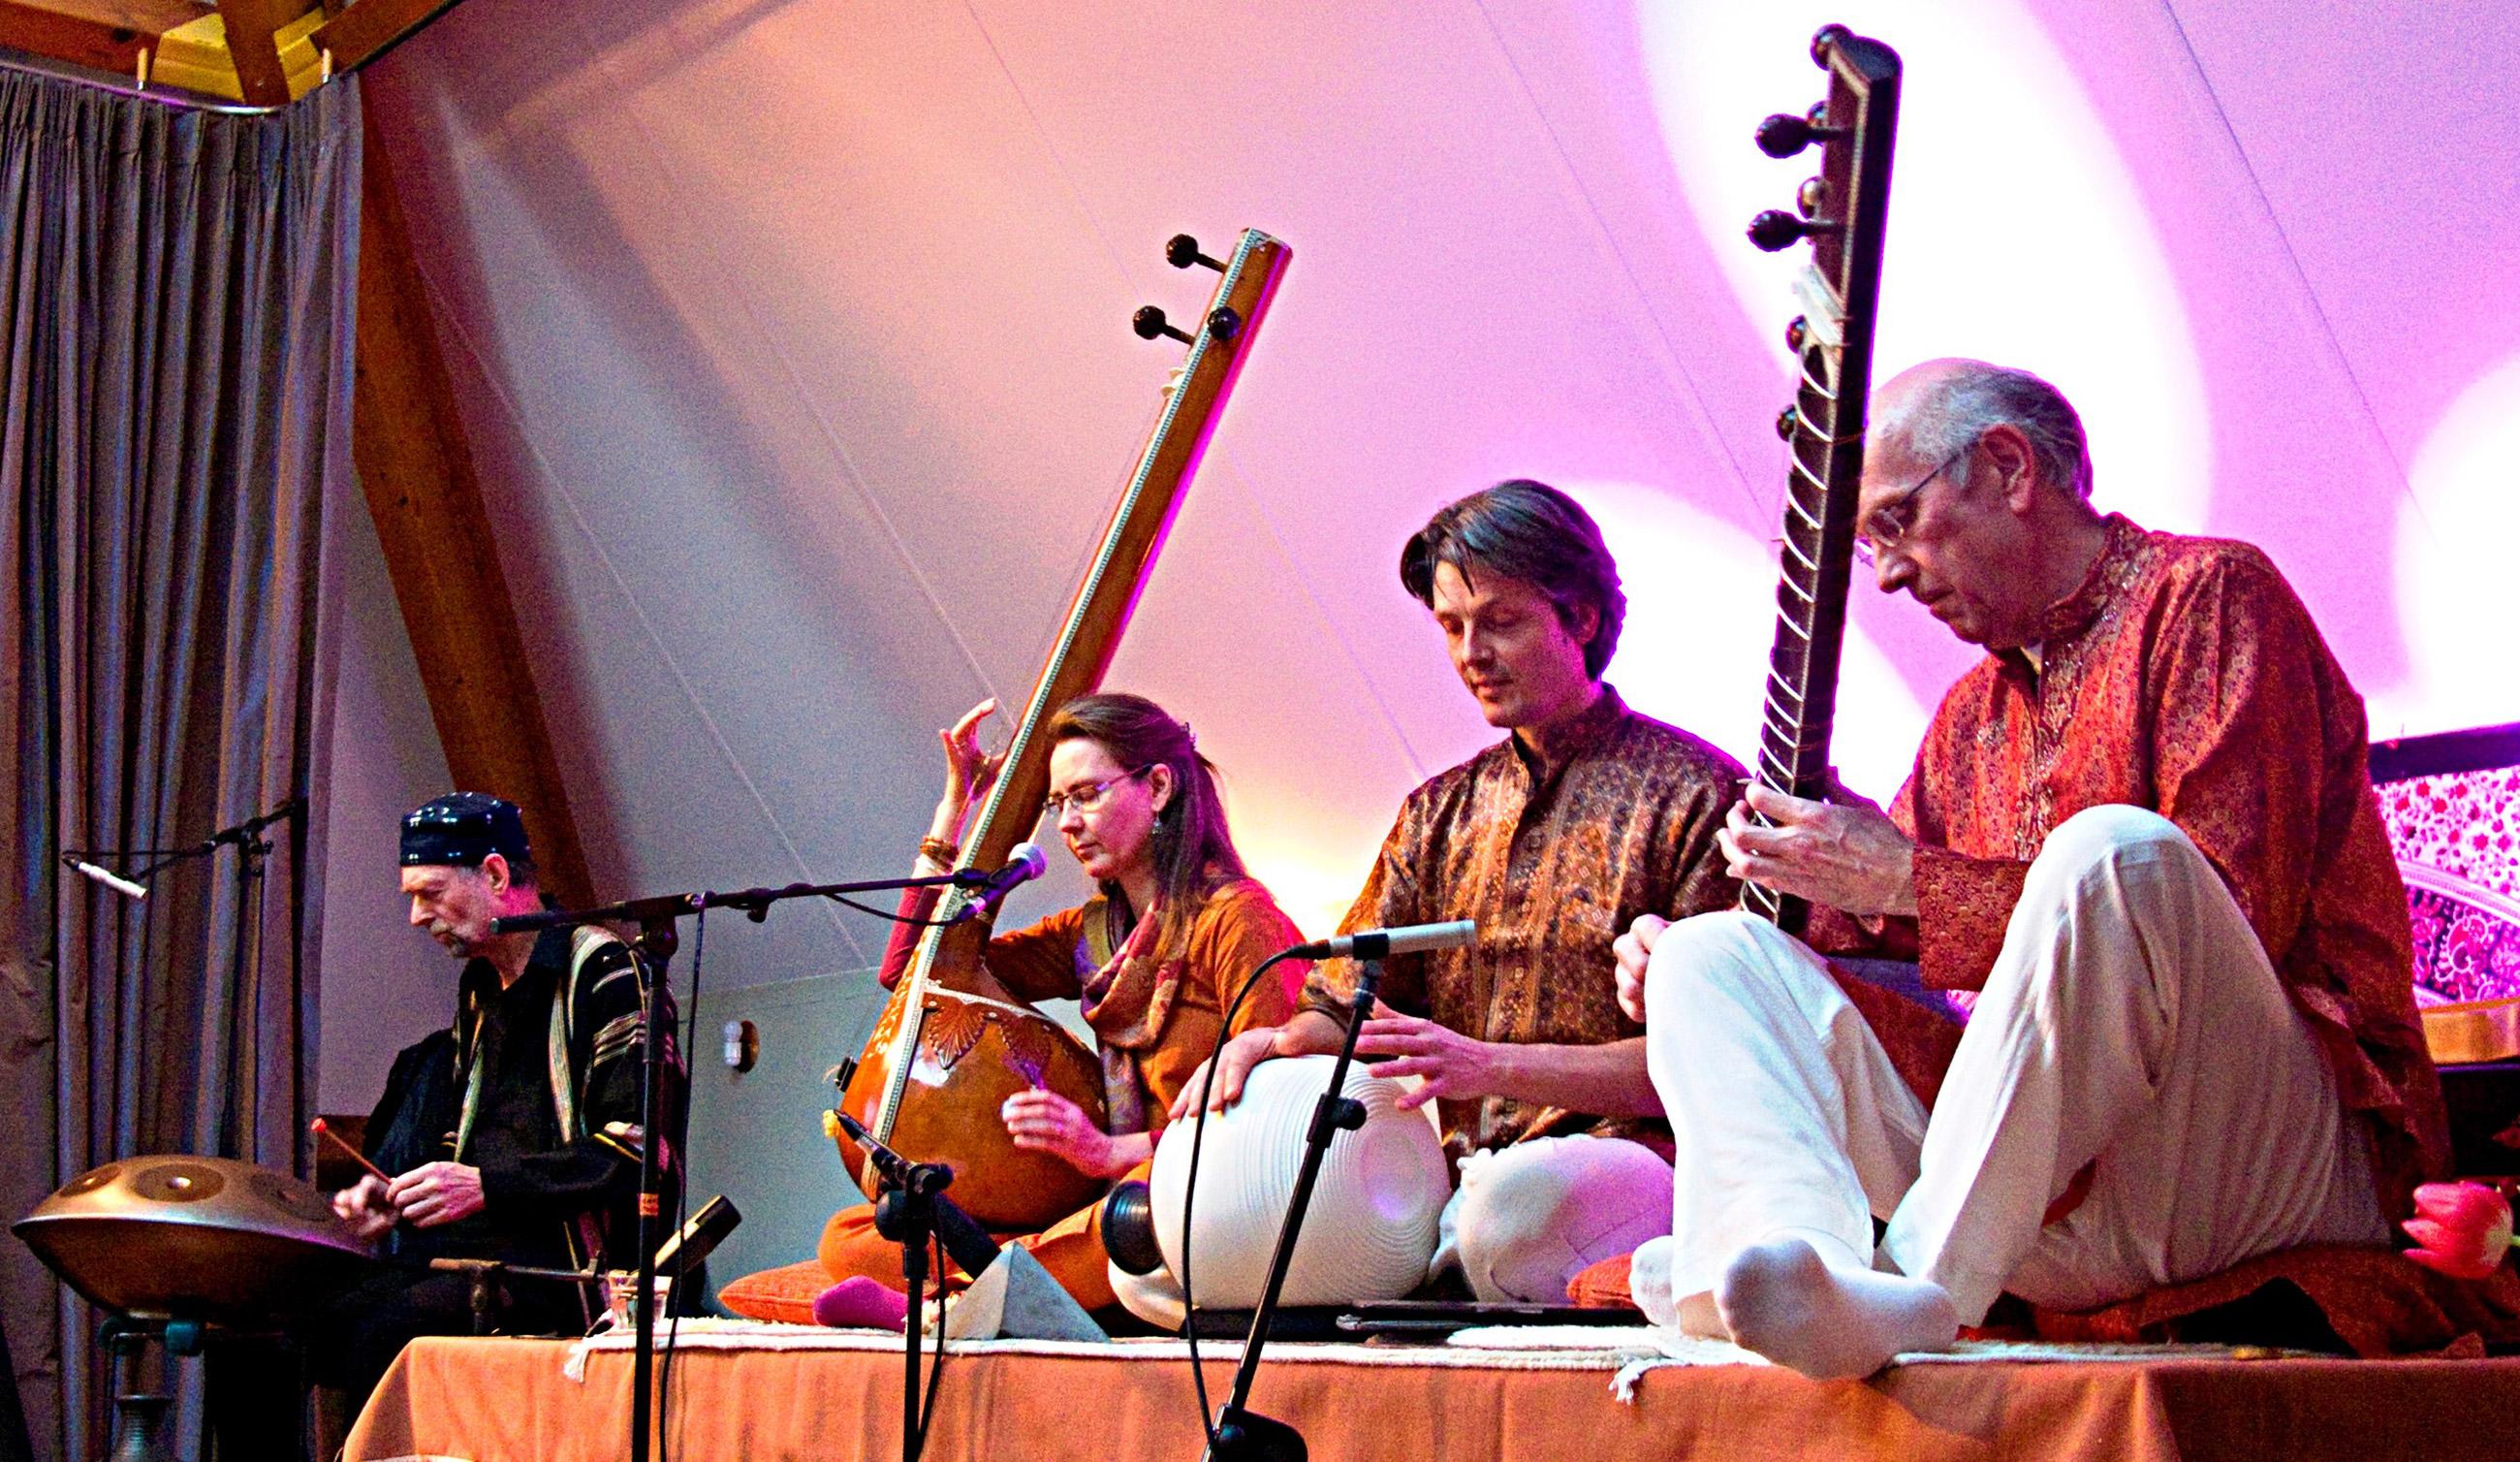 Wereldmuziek van Jugalbandi in Sarvata.